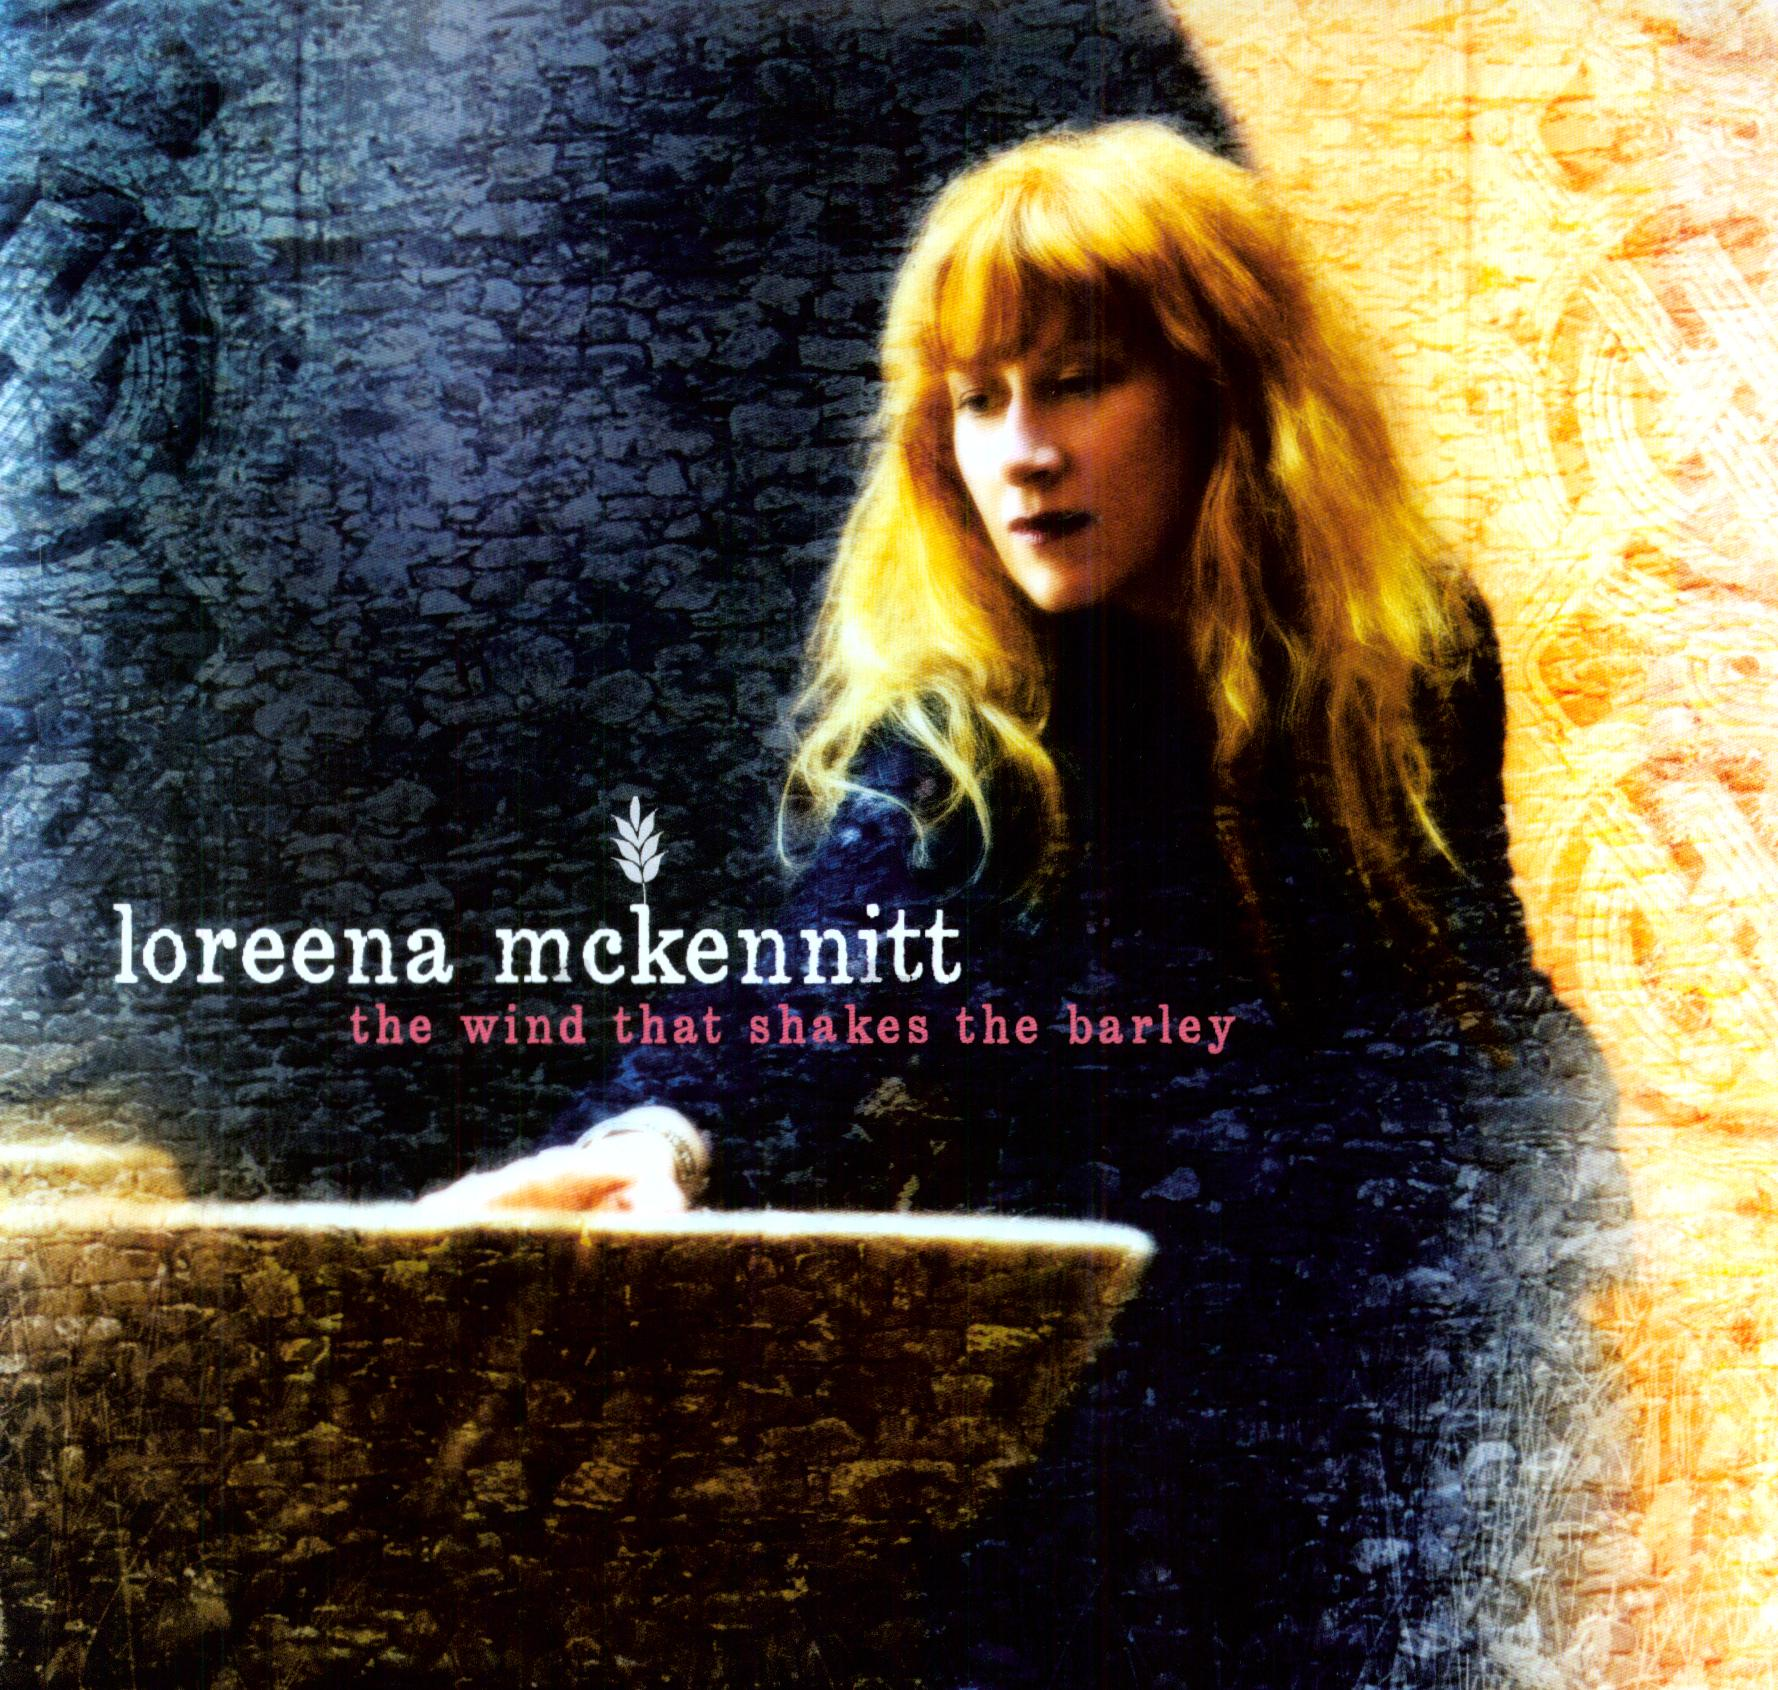 Loreena Mckennitt - Wind That Shakes The Barley (Vinyl)